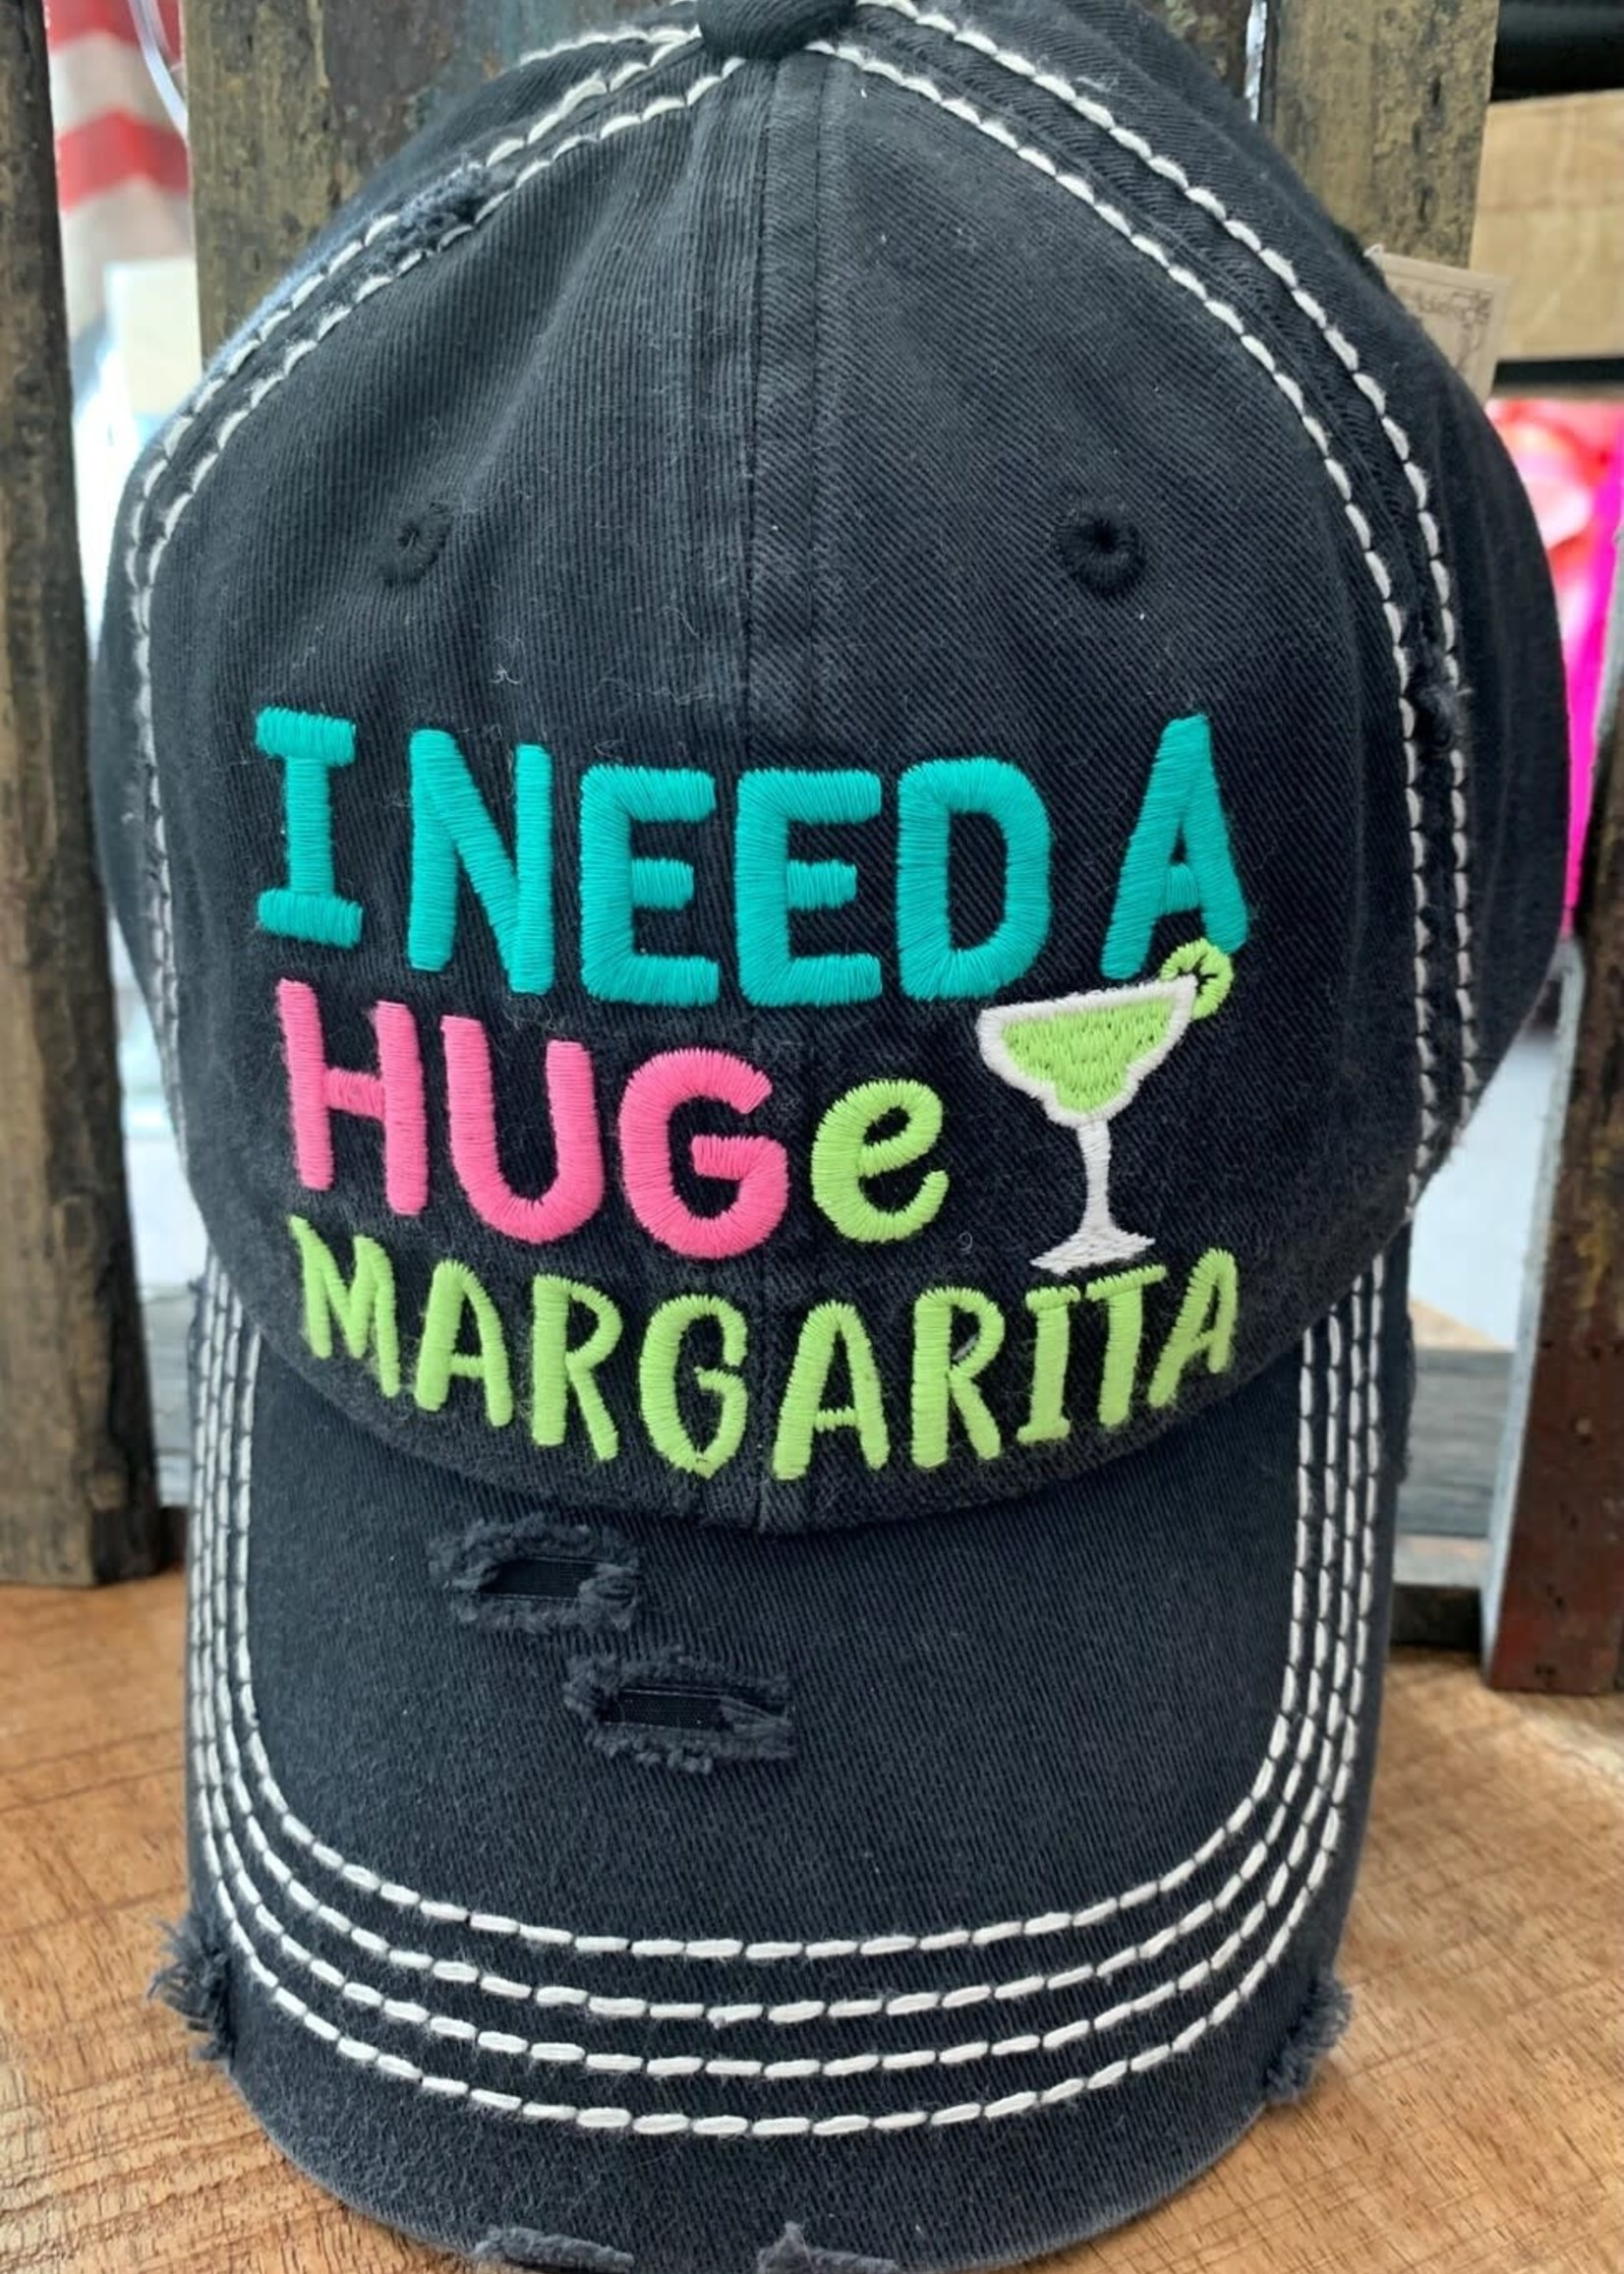 Your Fashion Wholesale I Need a Huge Margarita